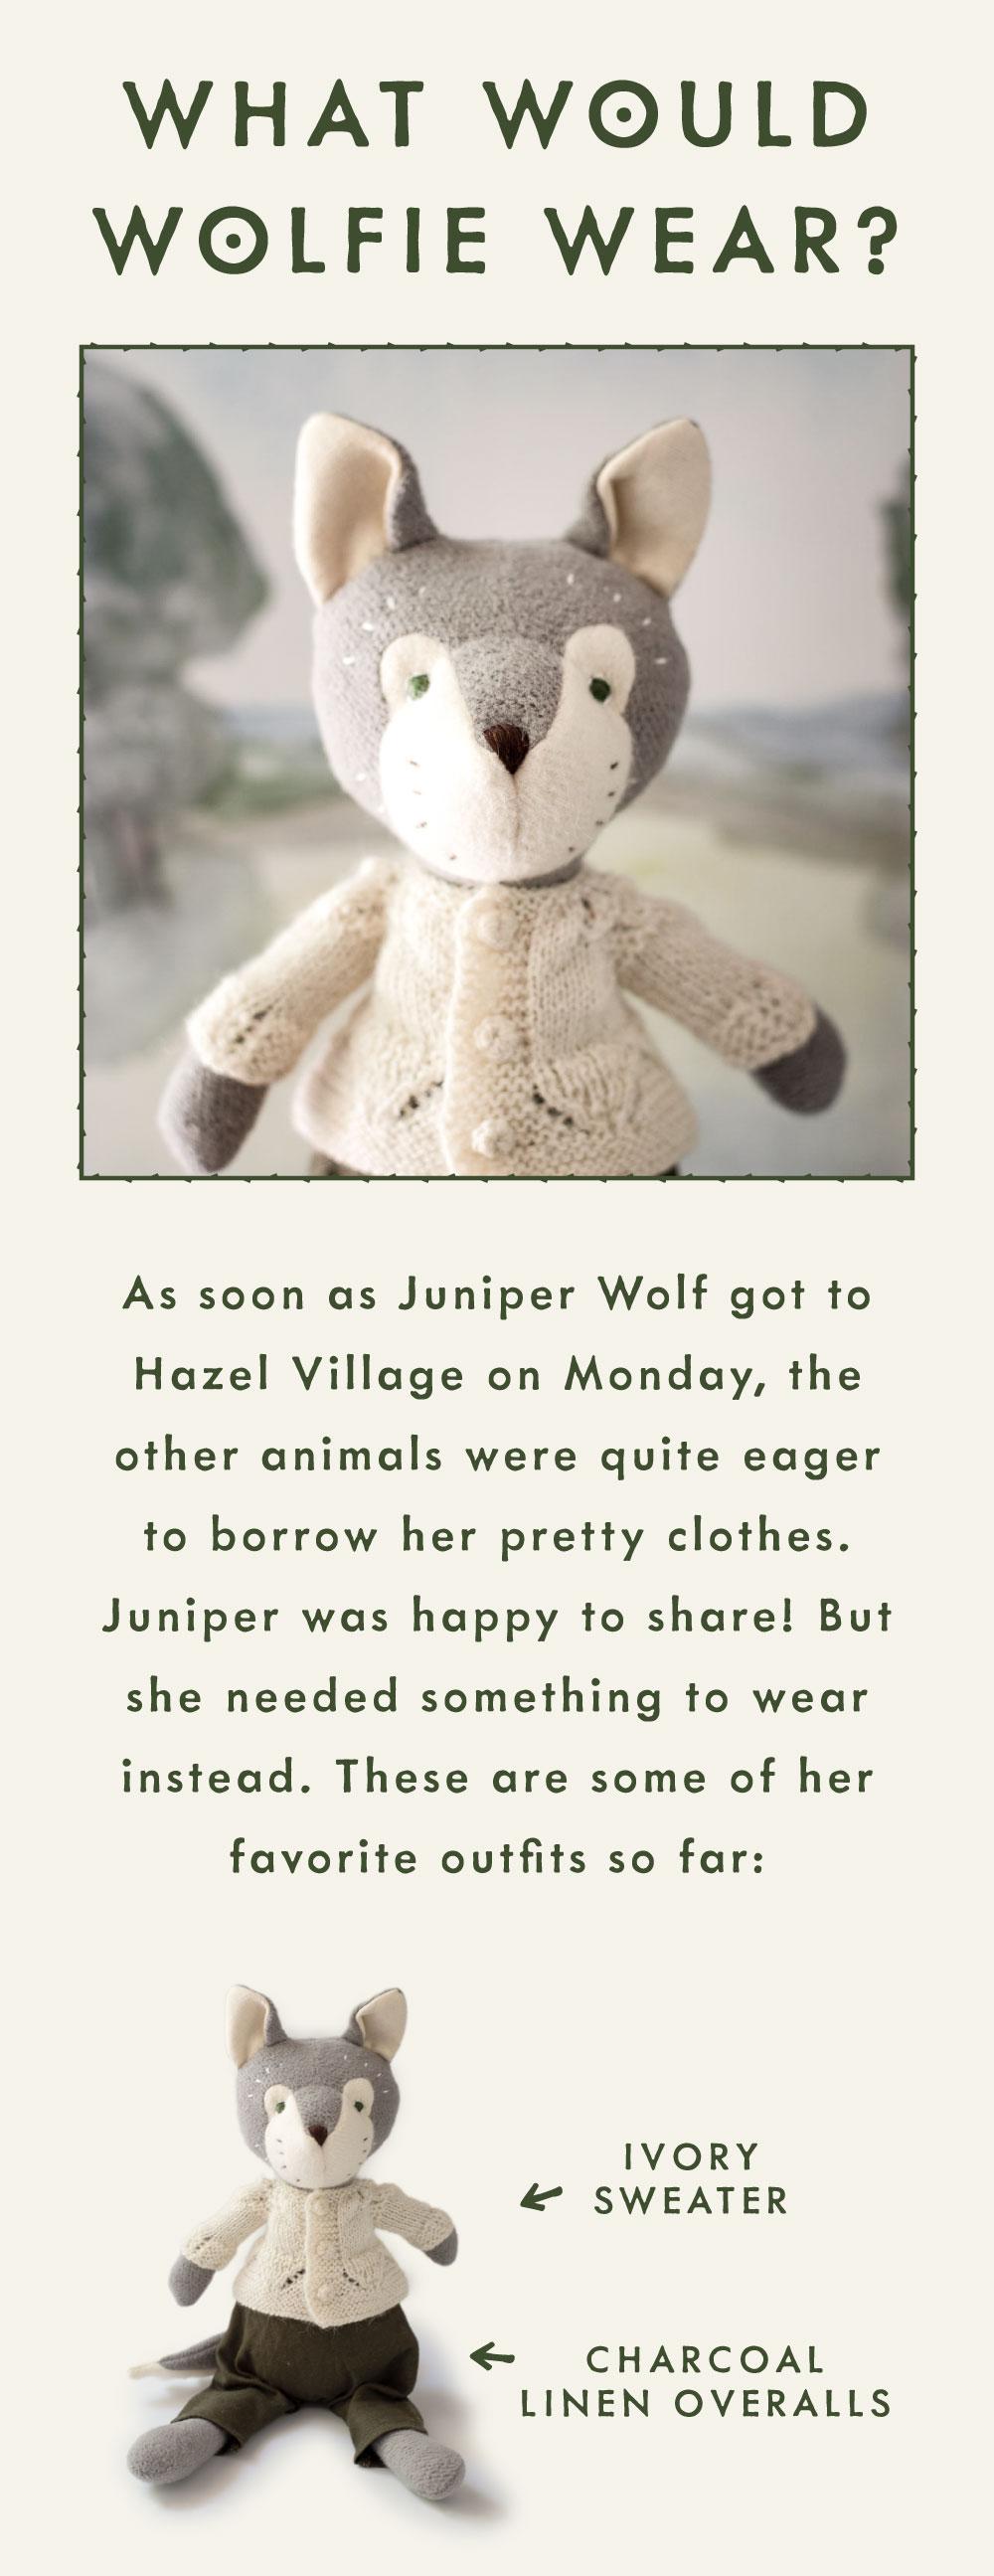 what would wolfie wear?